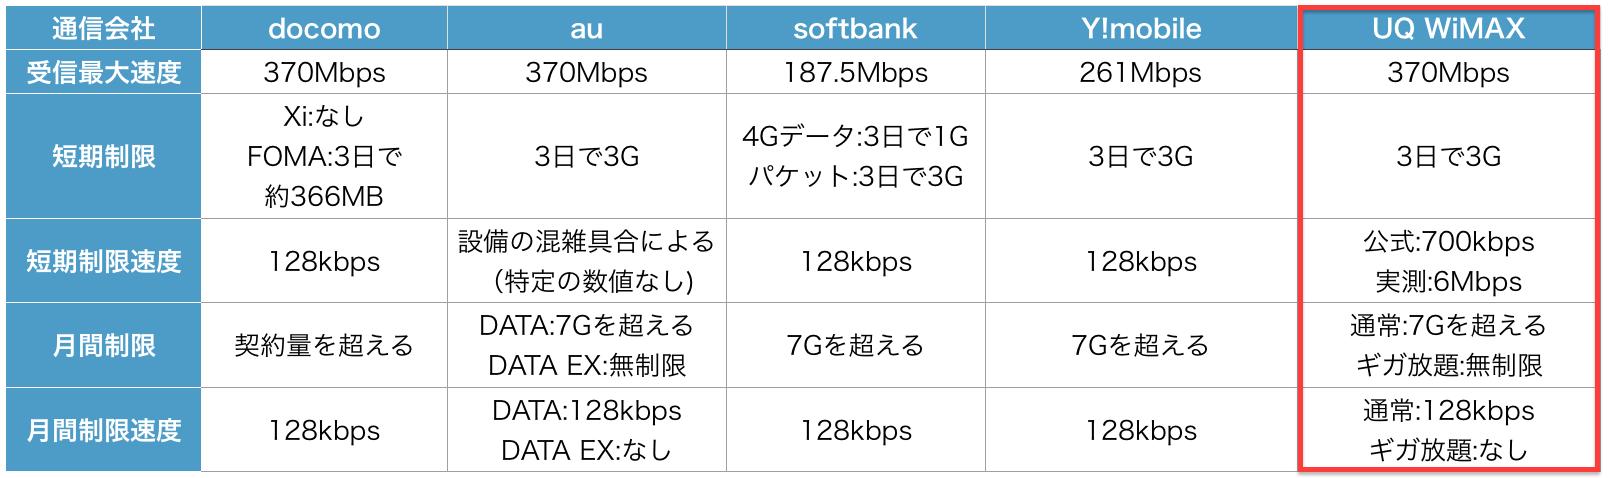 Pocket WiFi 506HW Y!mobile データ通信端末 比較